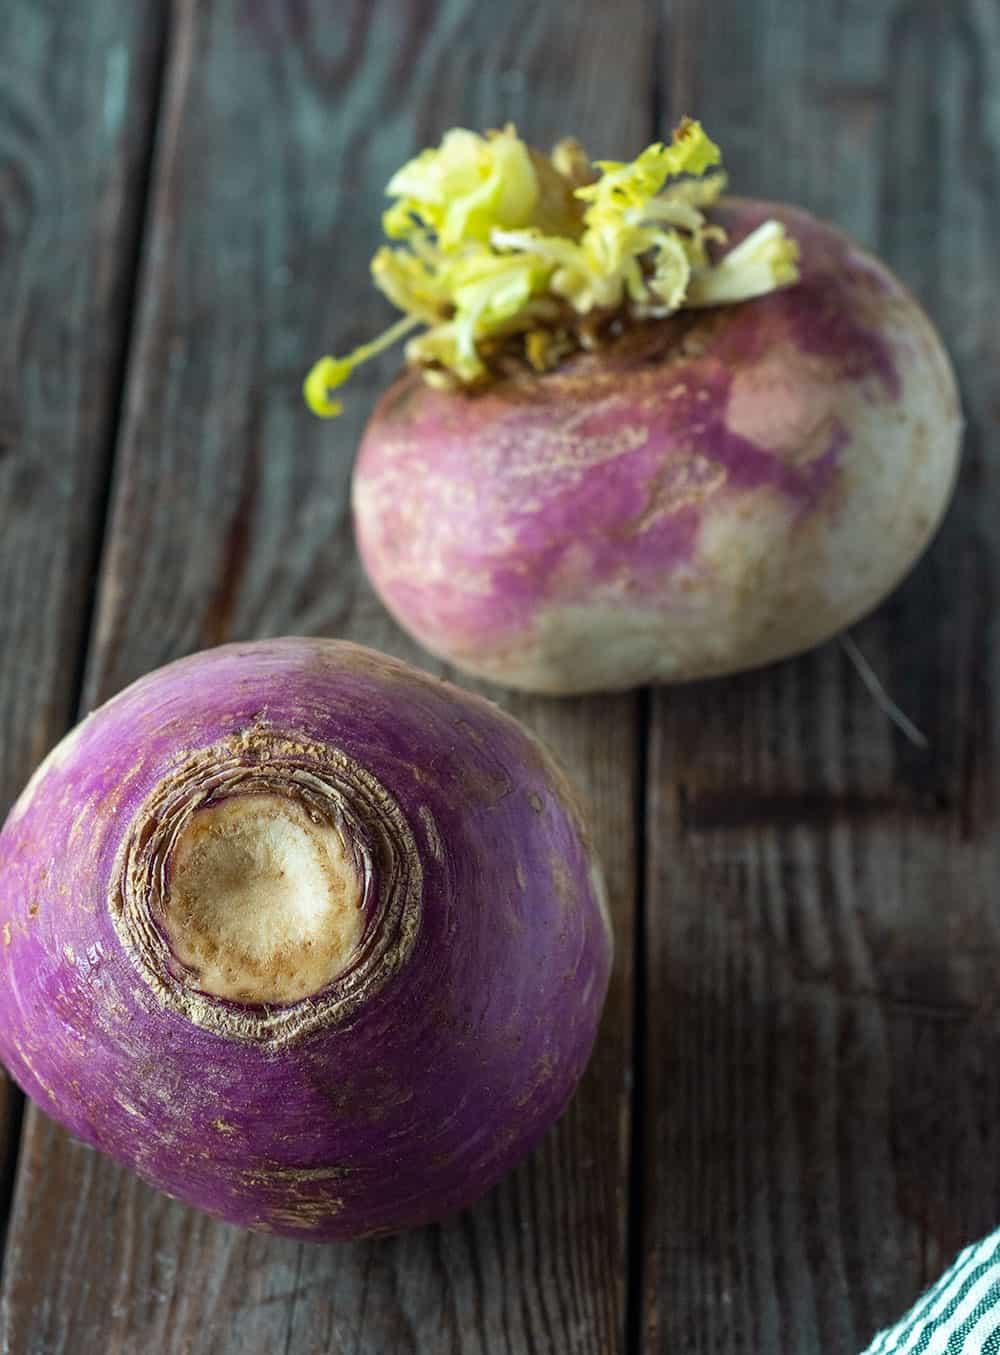 2 turnips with purple and white skin to make turnip fries